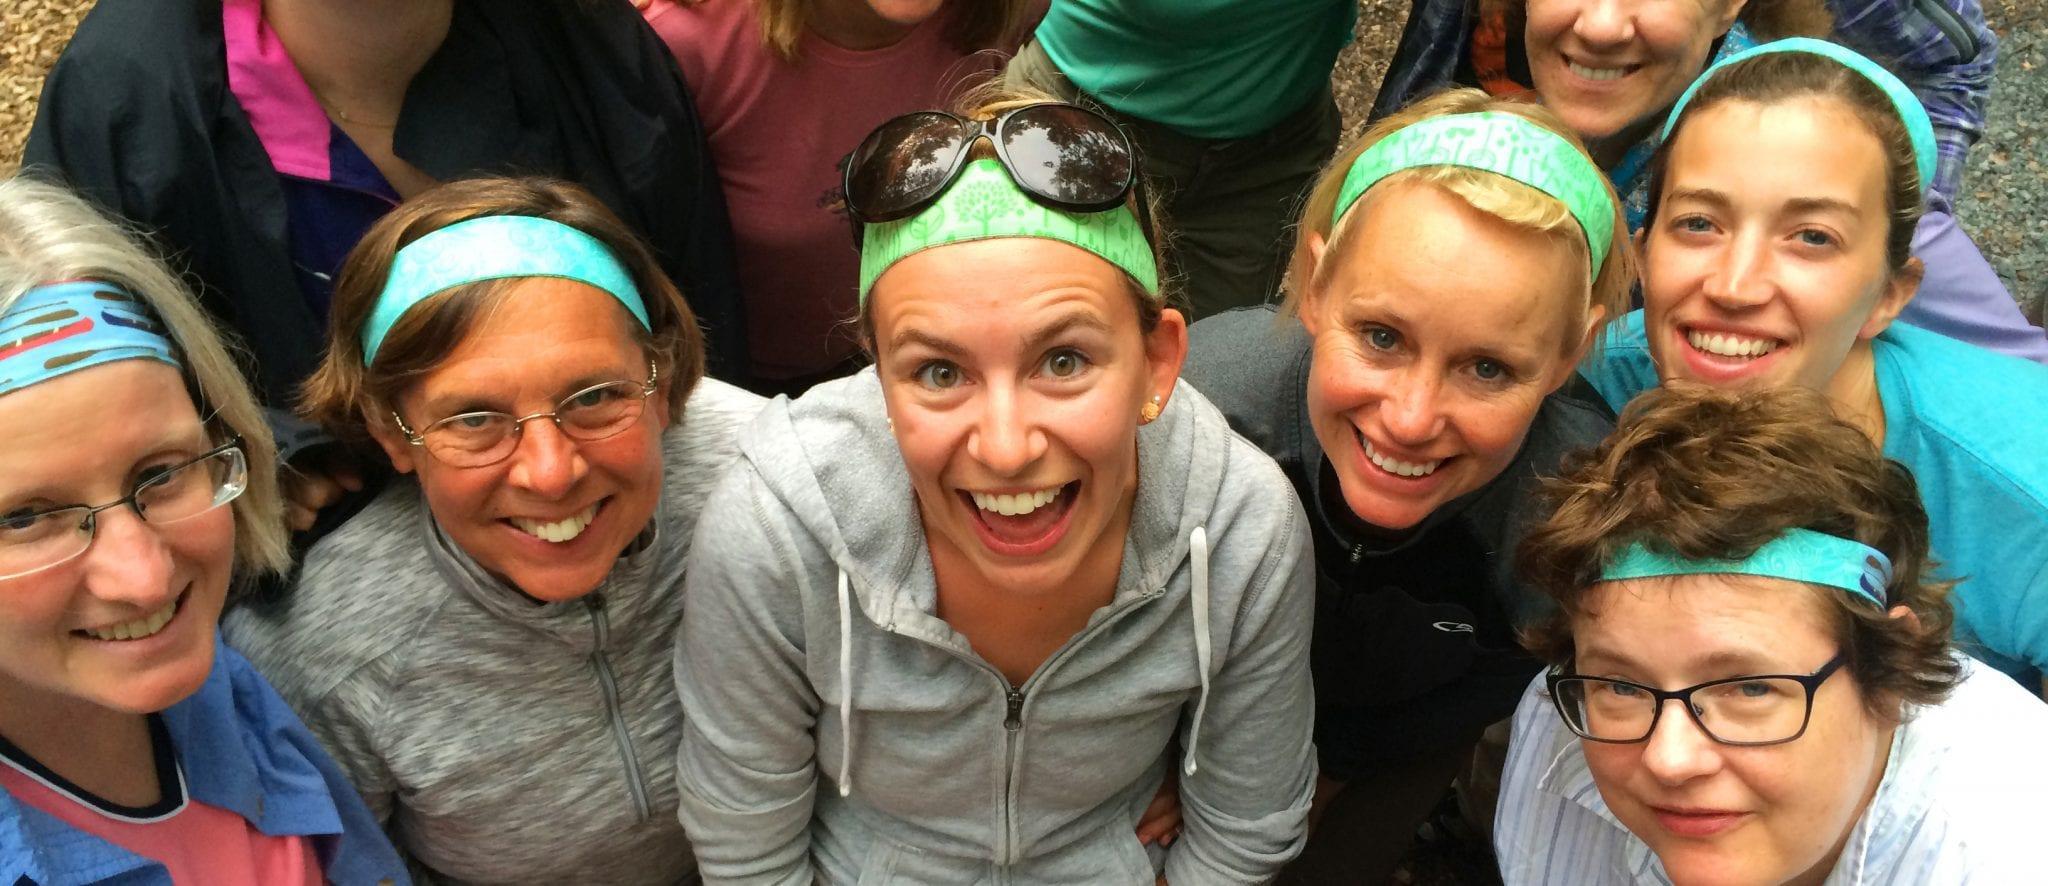 Women smiling at Apostle Islands National Lakeshore